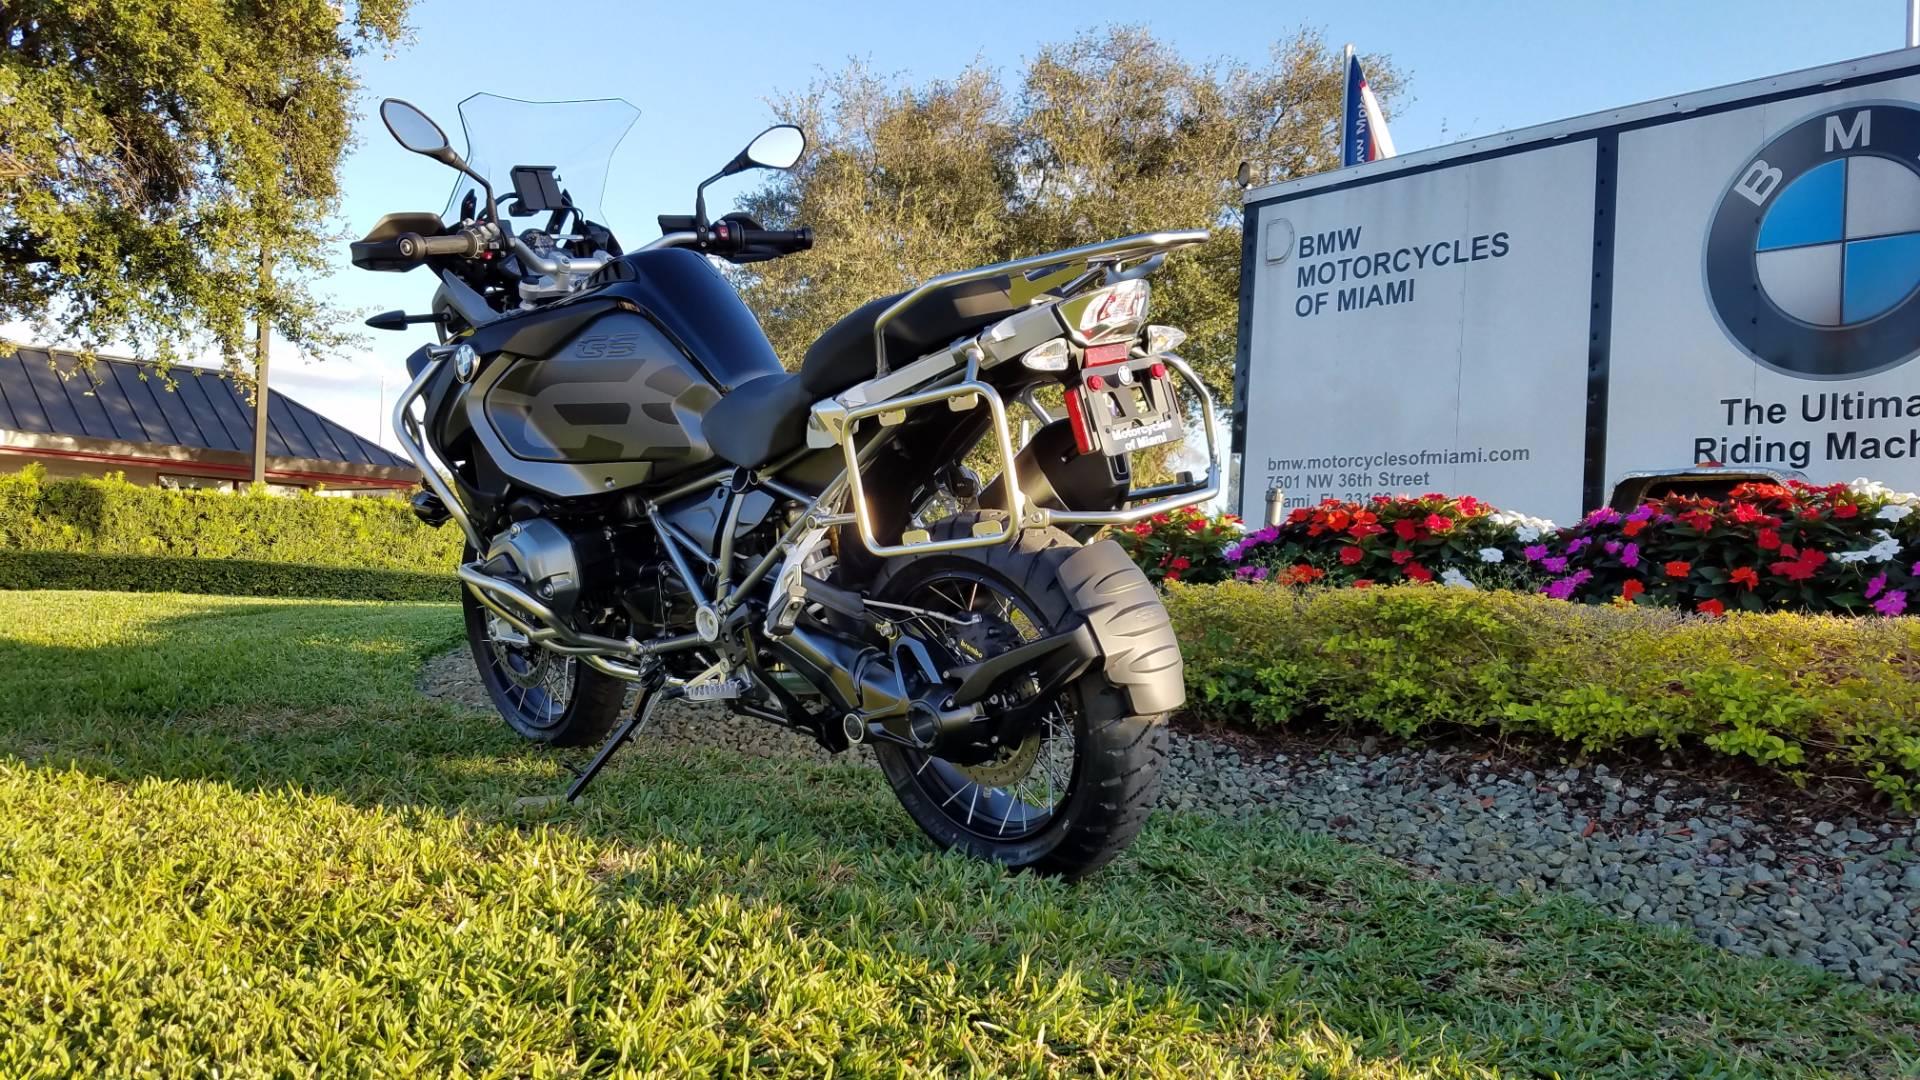 New 2017 BMW R 1200 GSA Triple Black For Sale, R 1200GS Adventure For Sale, BMW Motorcycle Adventure, new BMW Motorcycle